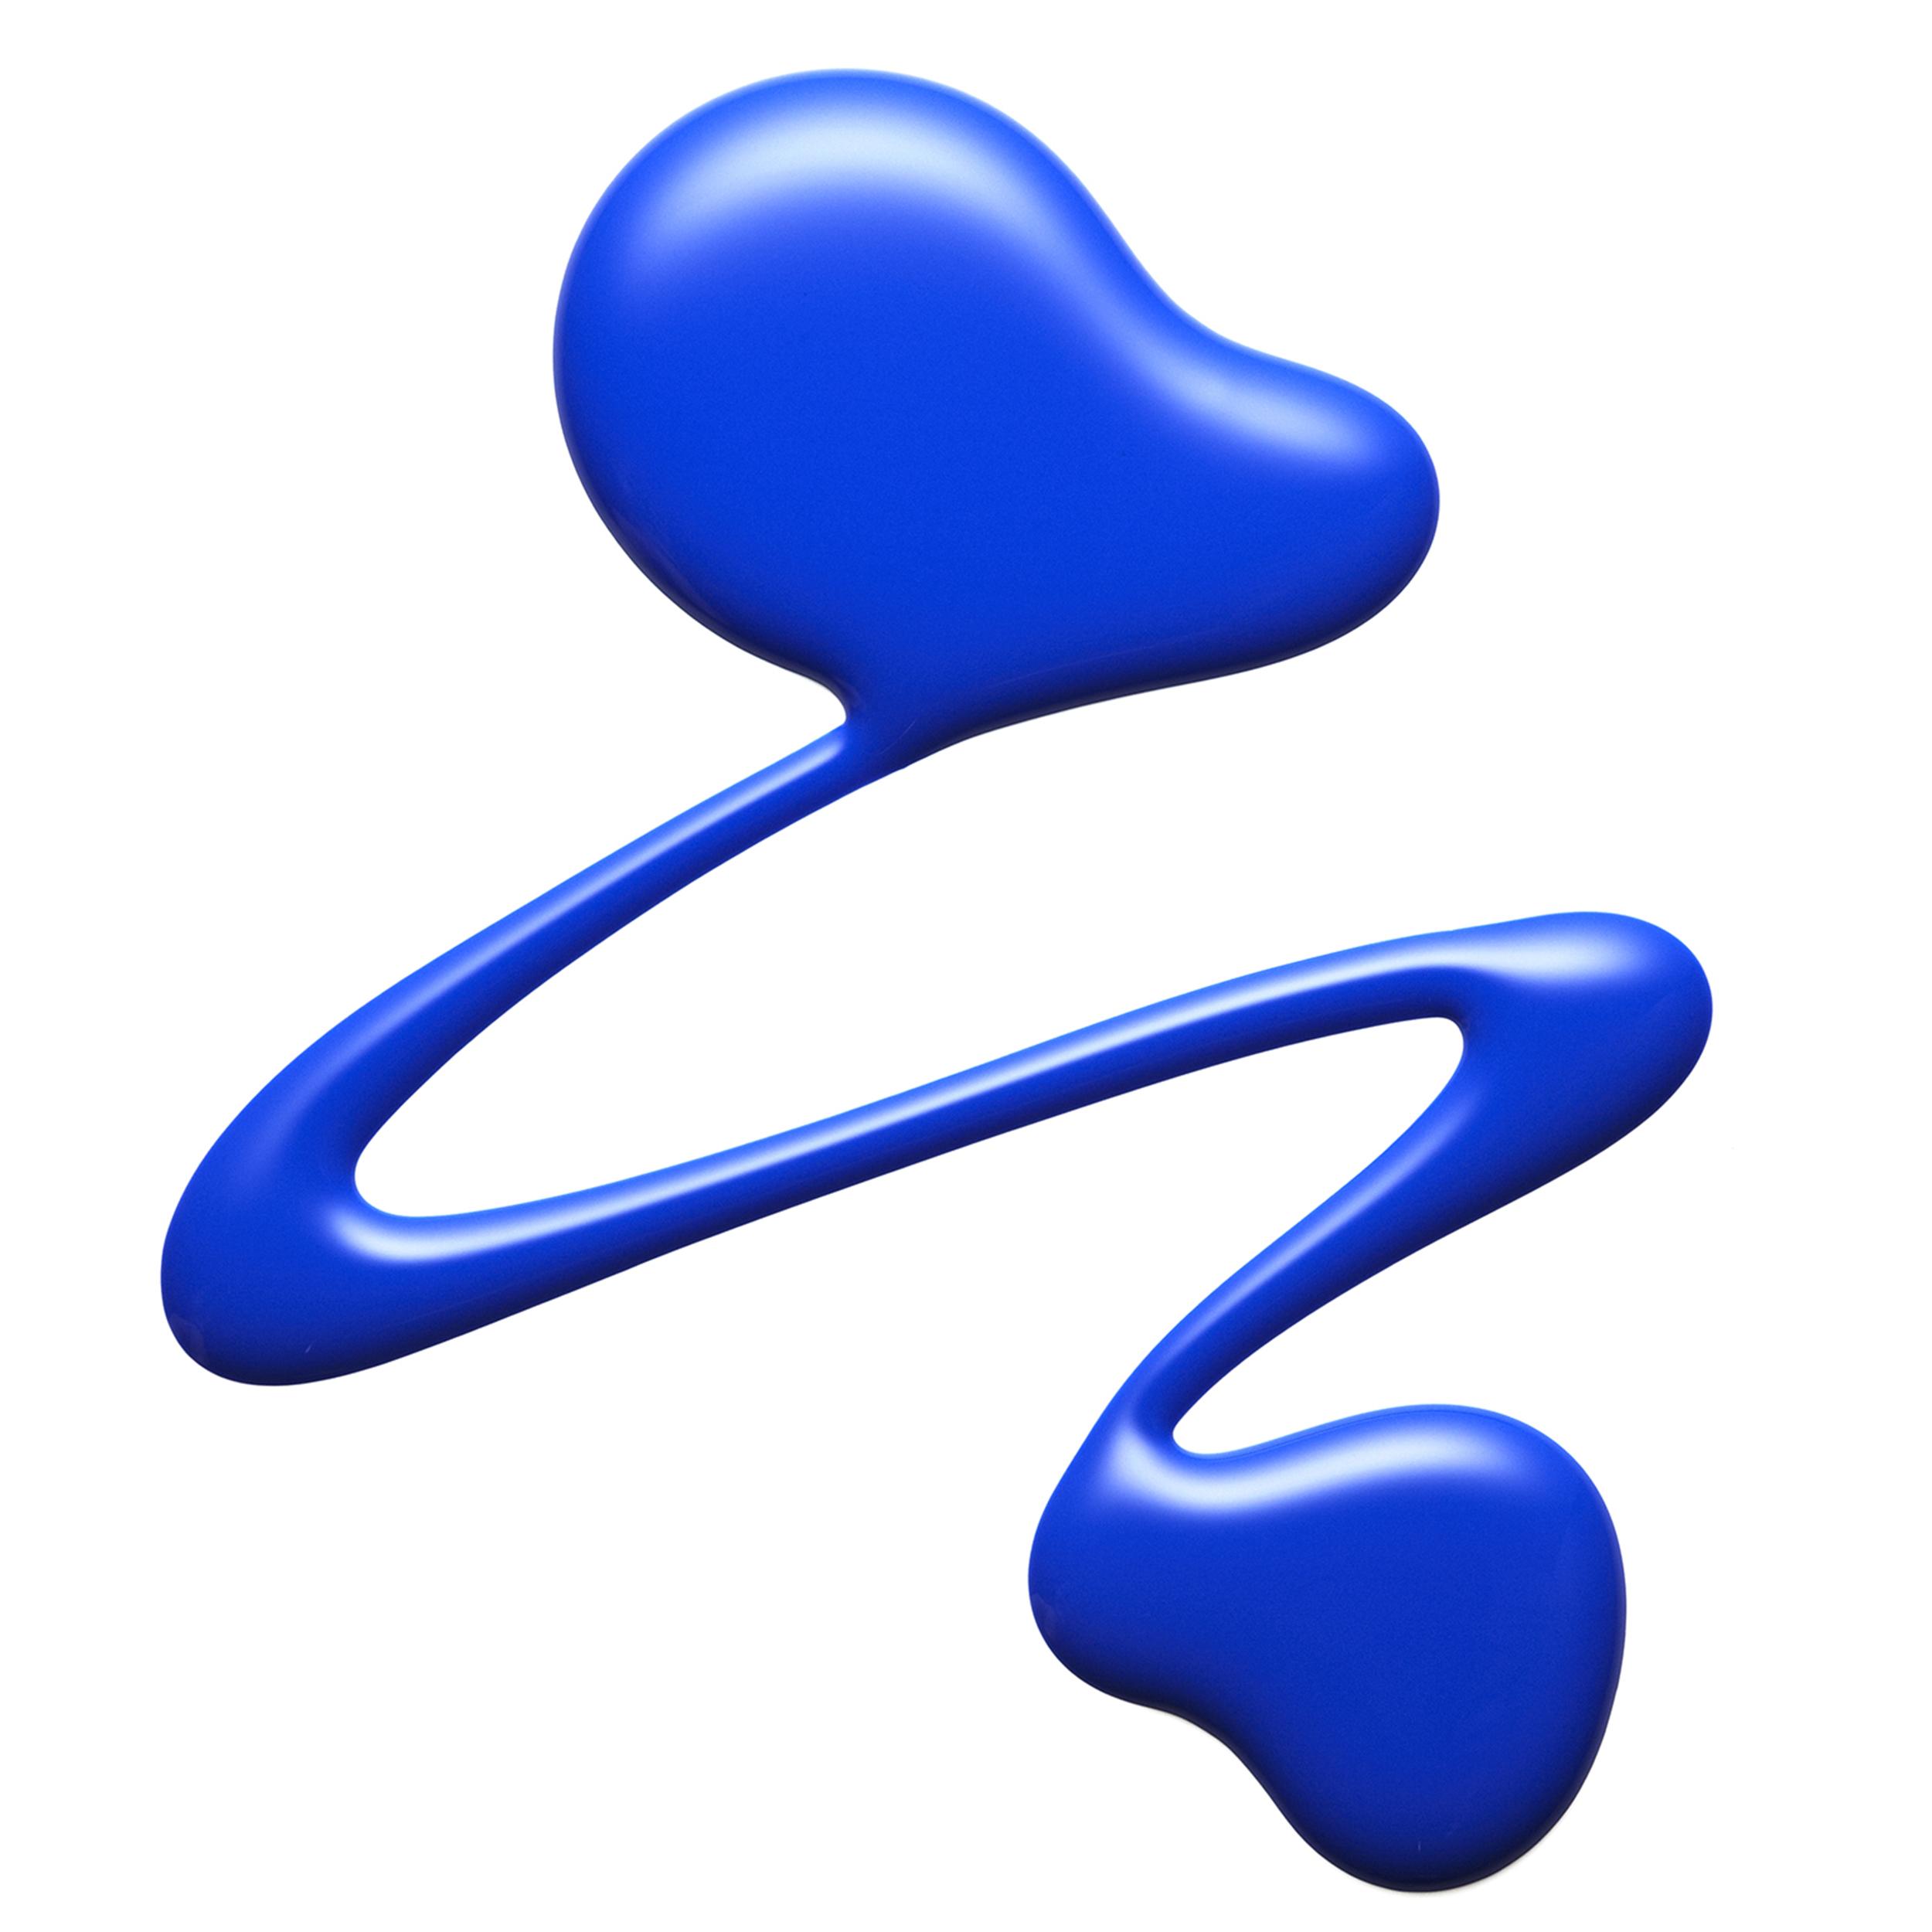 Blue-Essie-Squiggle.jpg